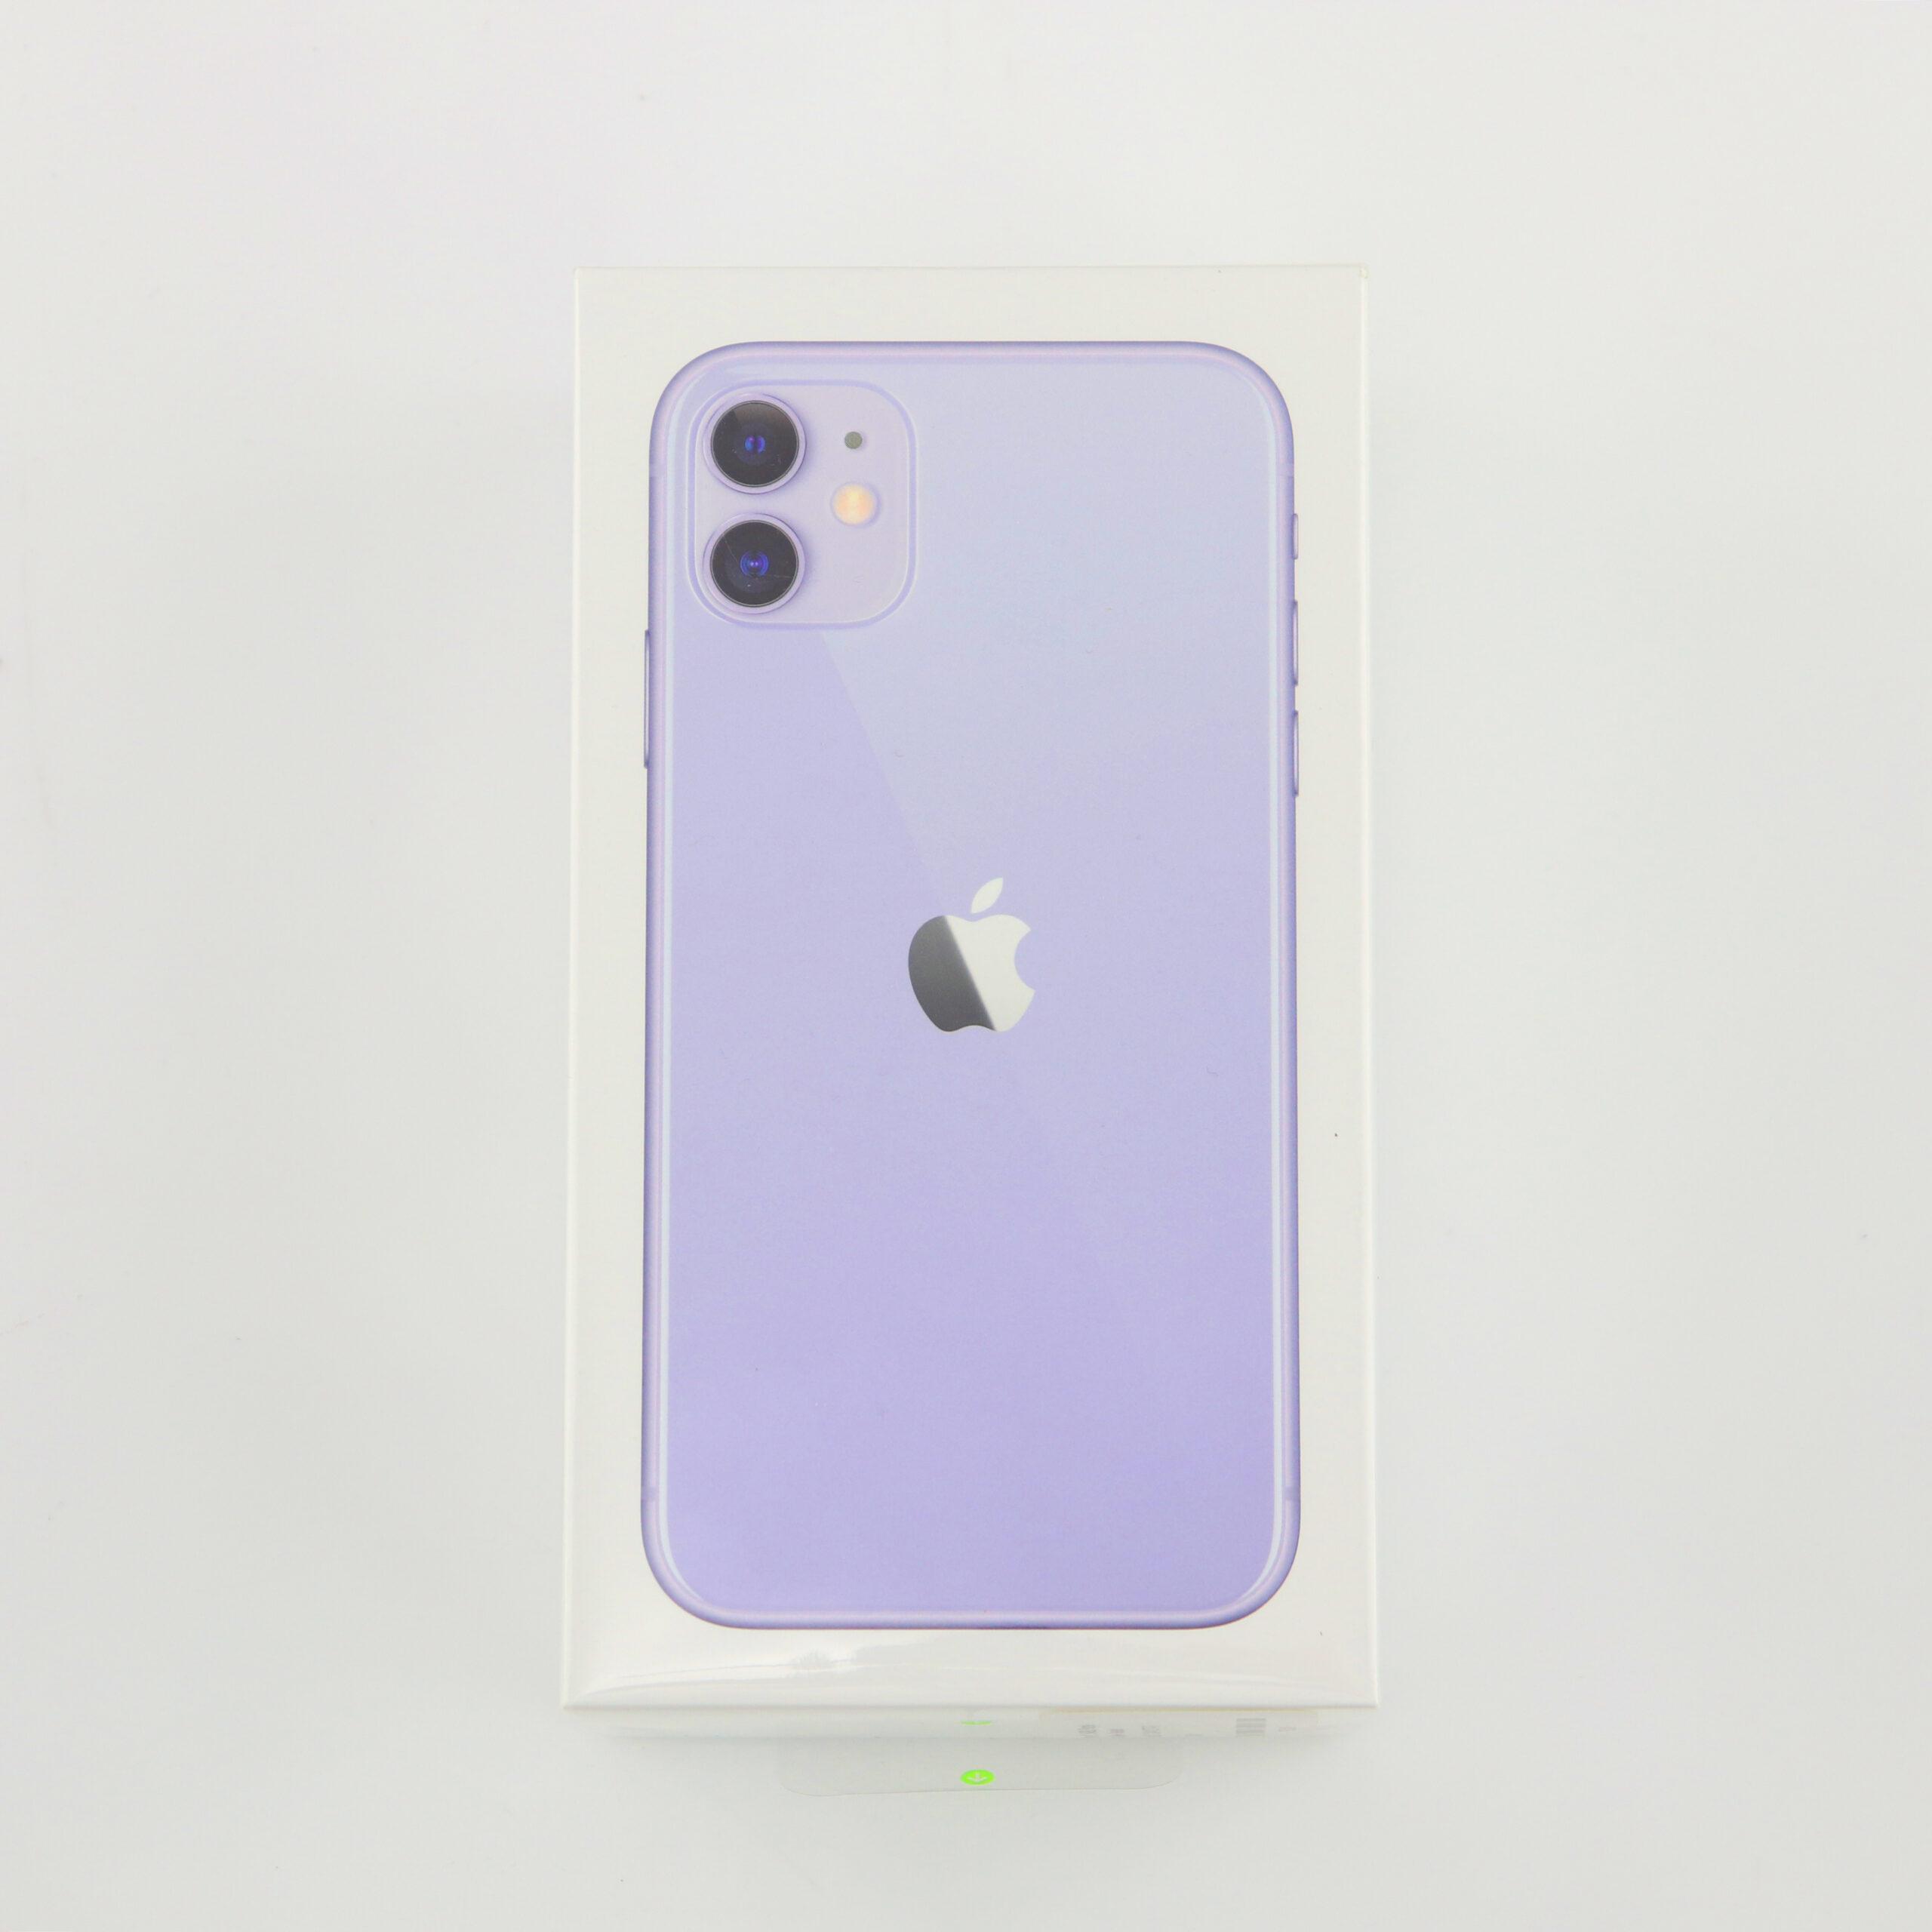 1 x Apple iPhone 11 (Unlocked) 64GB Purple (BRAND NEW)